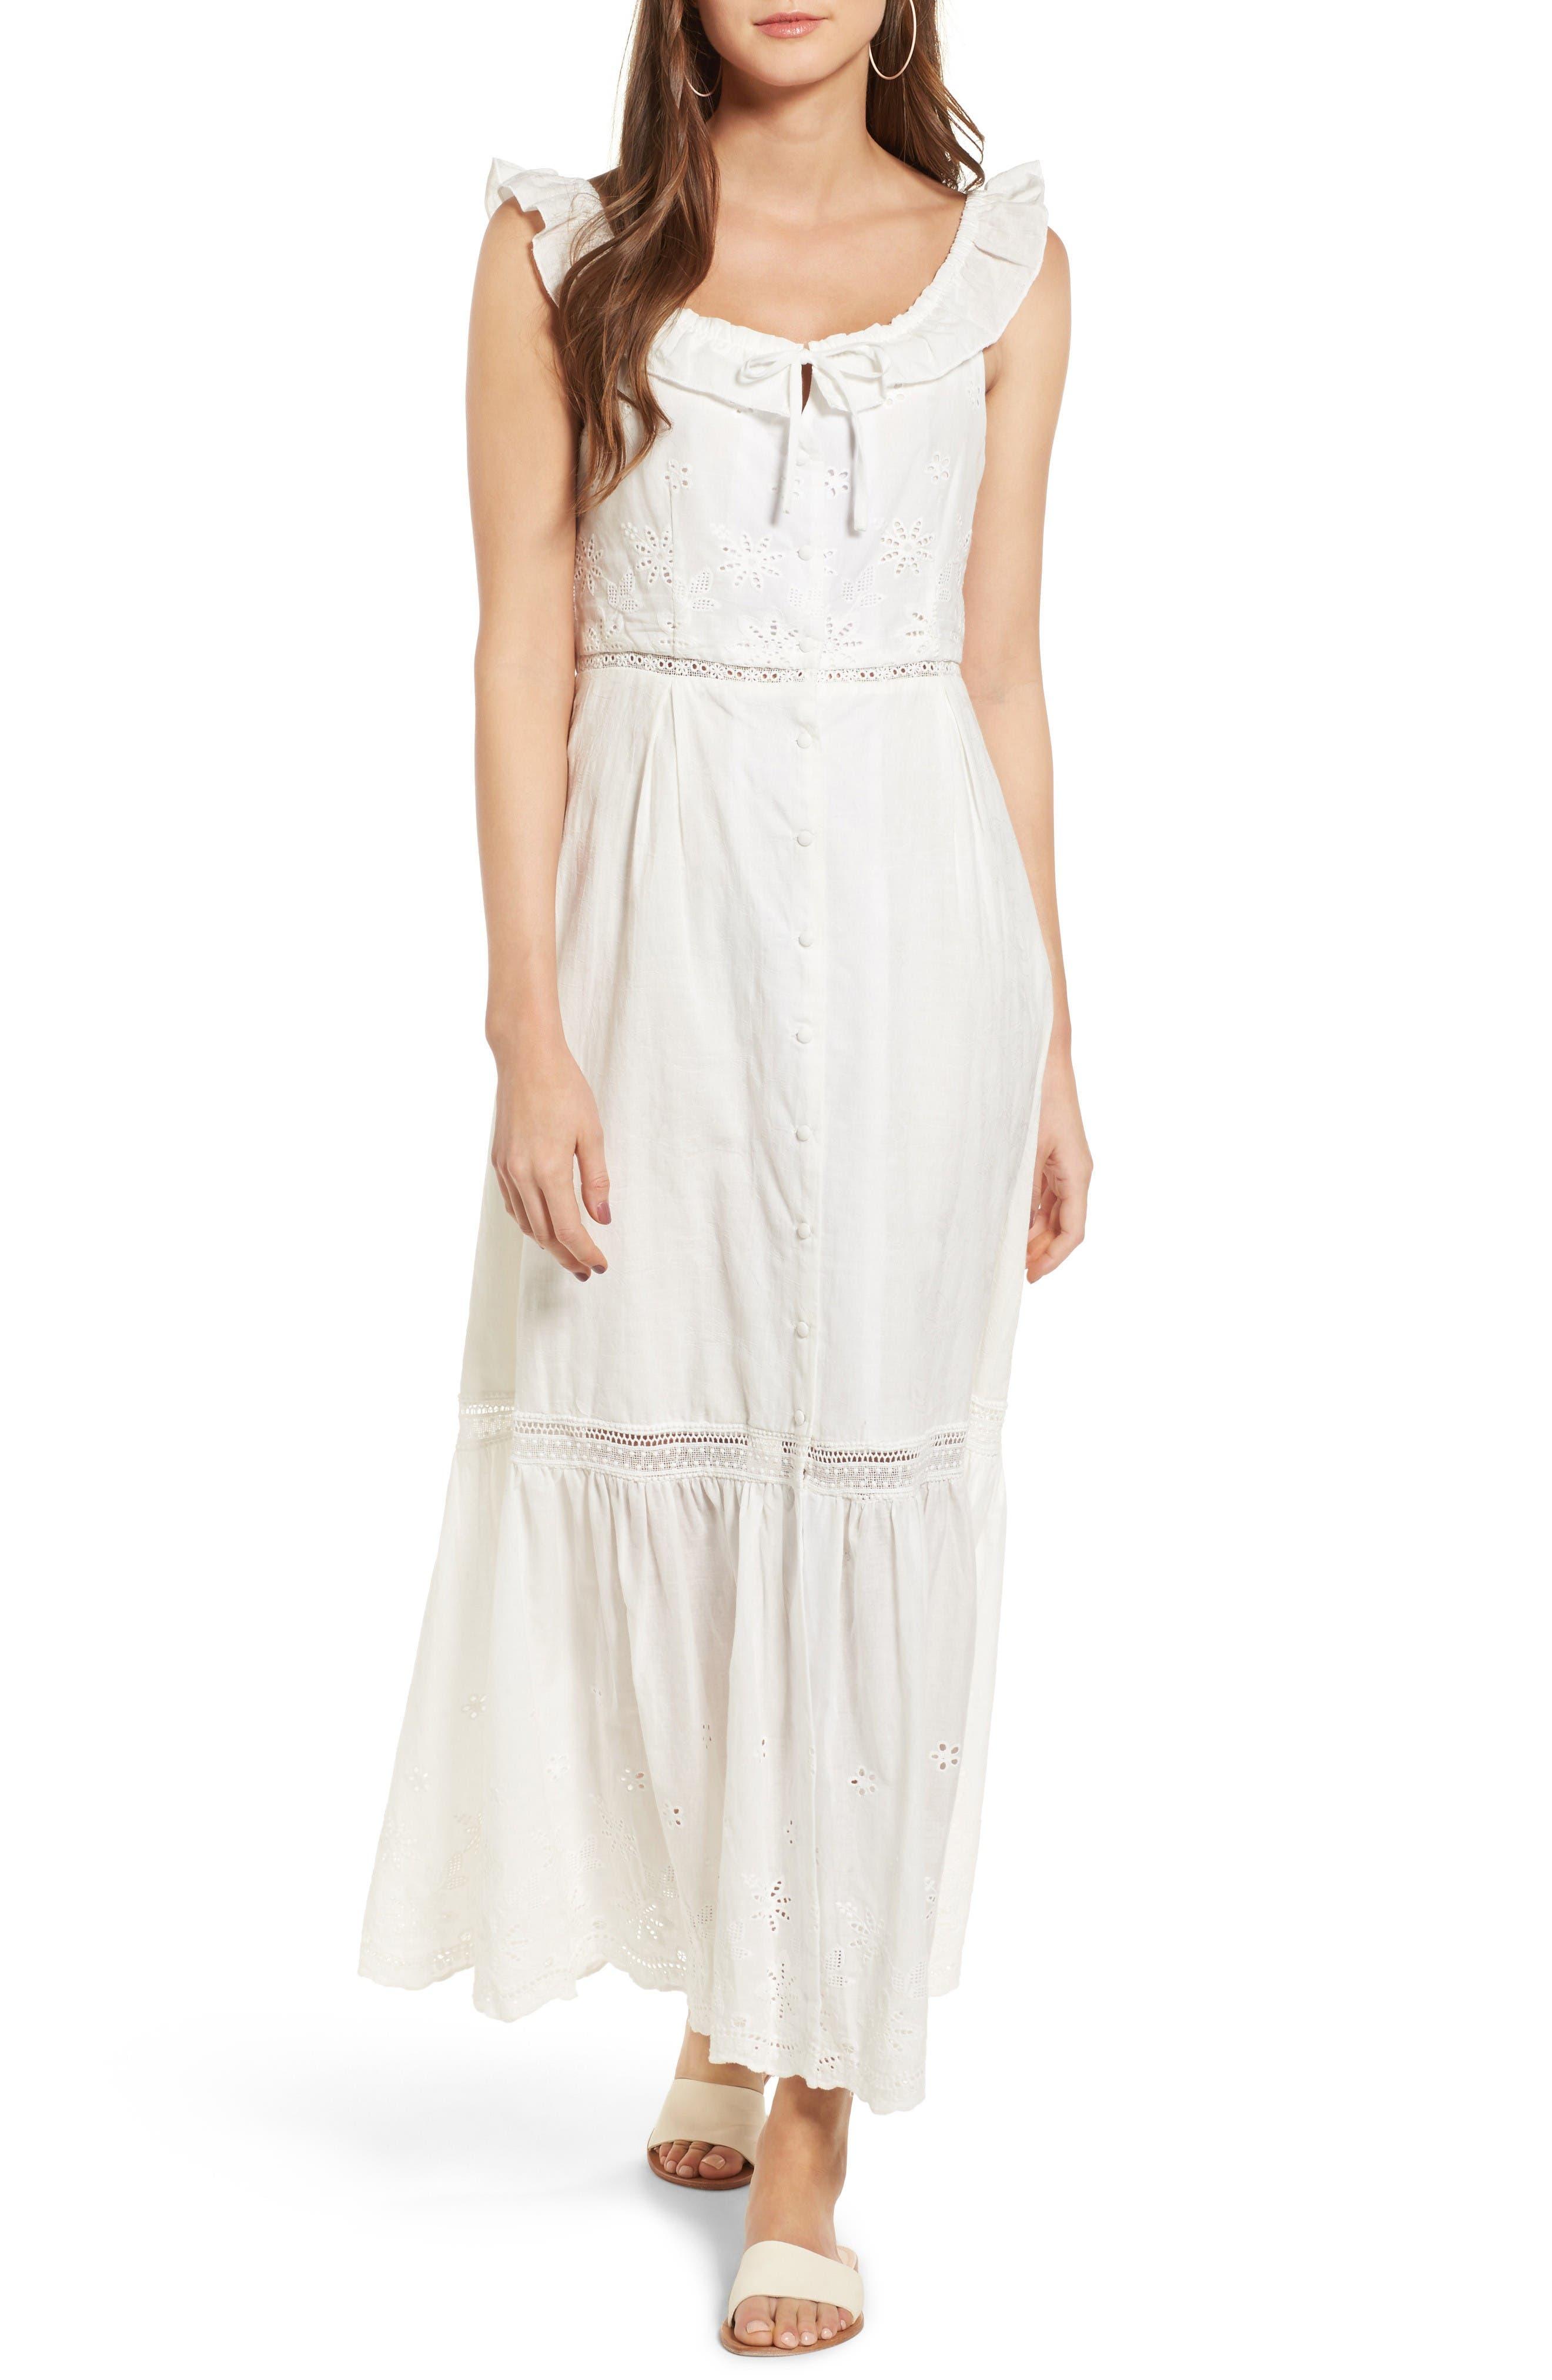 Sky Might Fall Midi Dress,                         Main,                         color, Off White